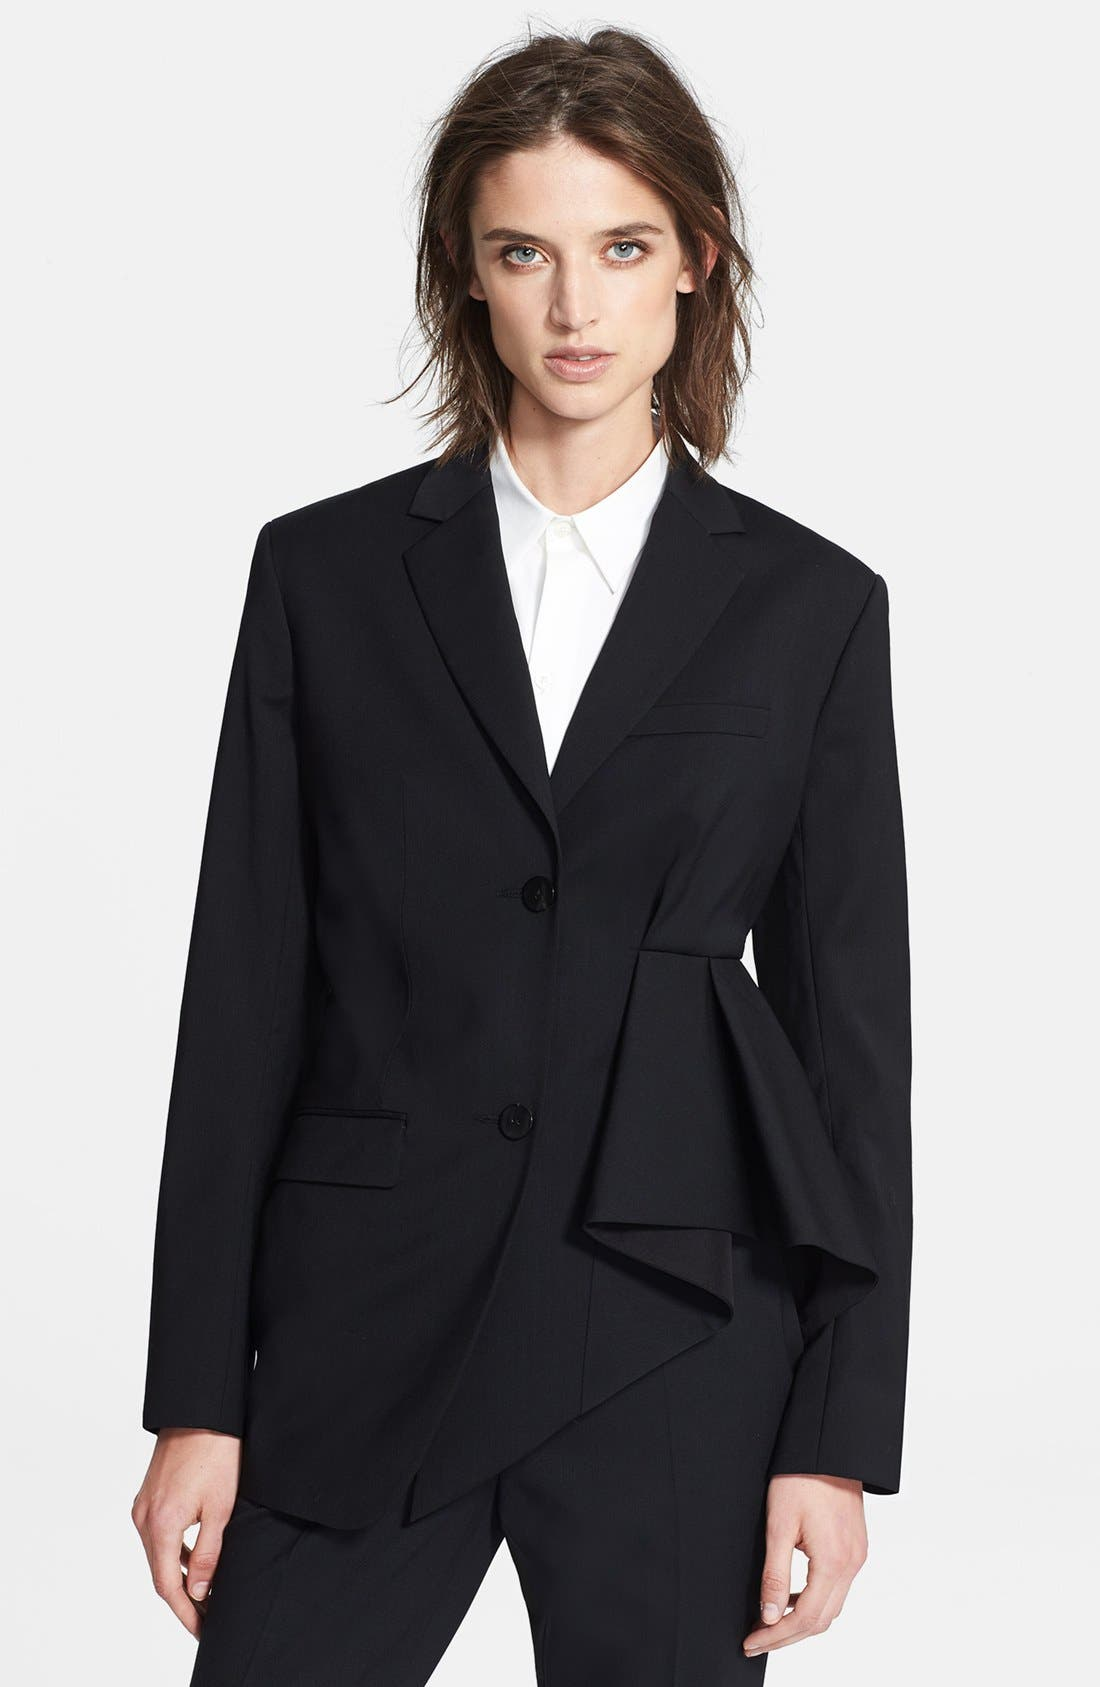 Main Image - Theory 'Jester' Wool Blend Jacket